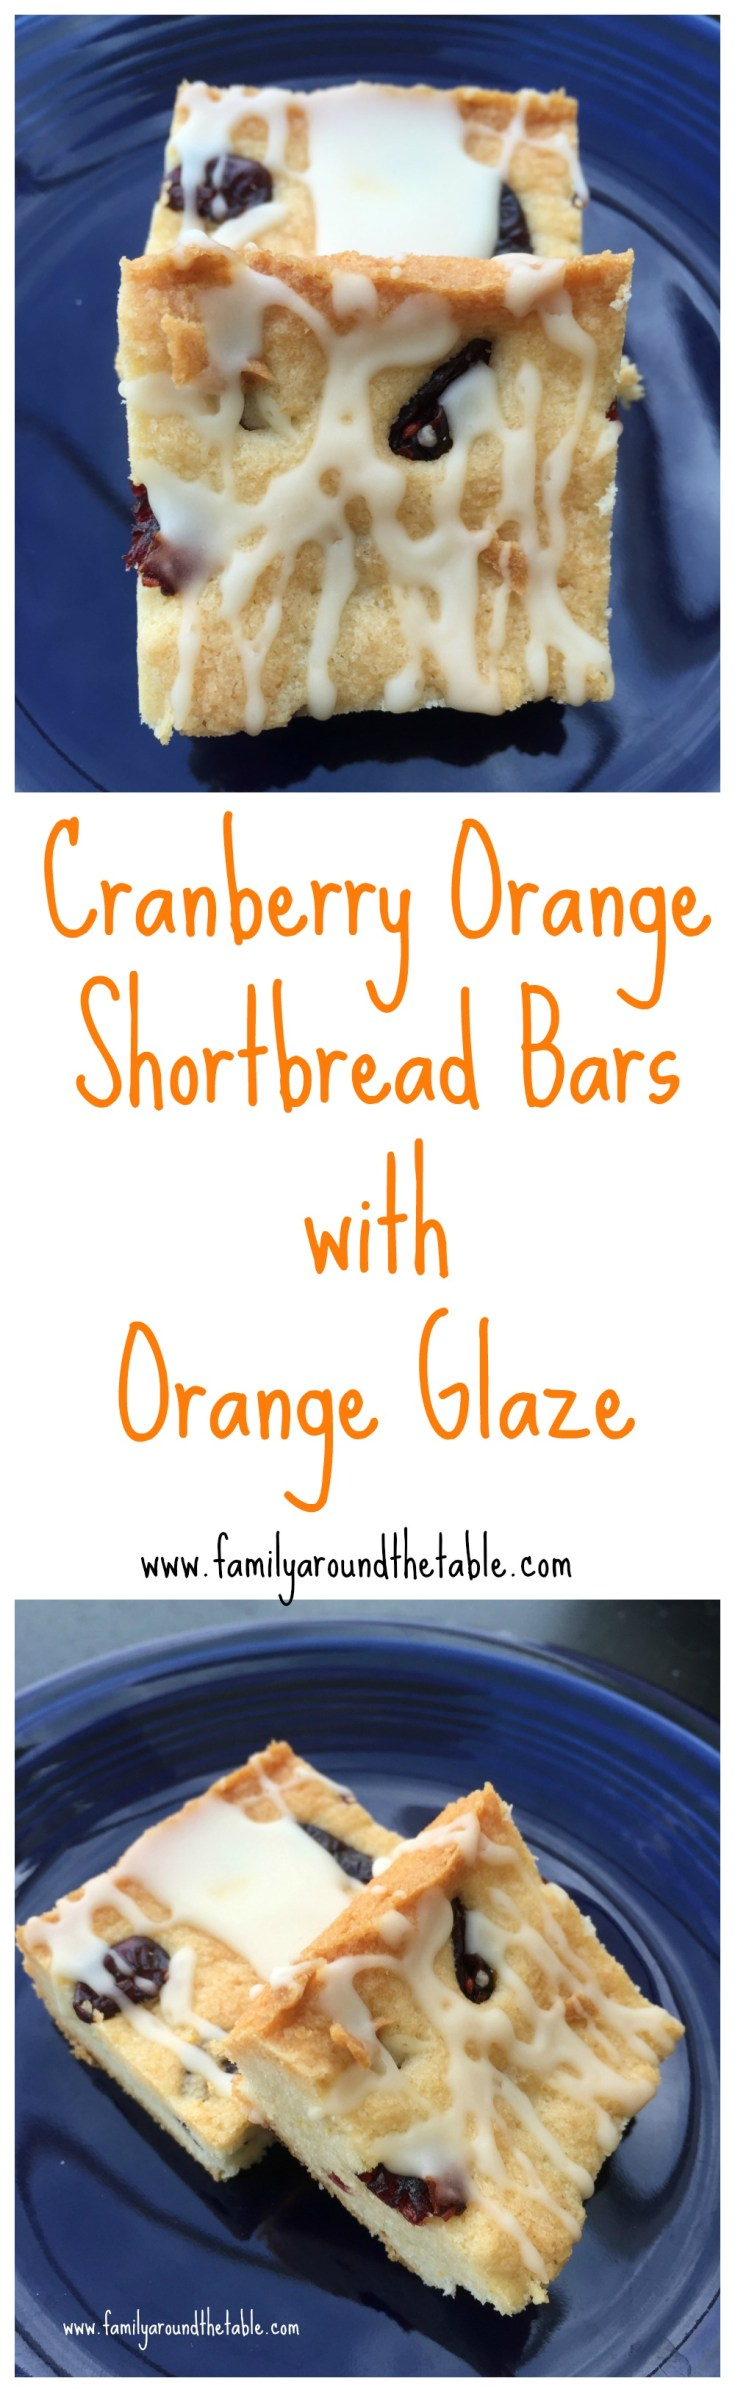 Cranberry Orange Shortbread Bars with Orange Glaze are a delicious seasonal treat